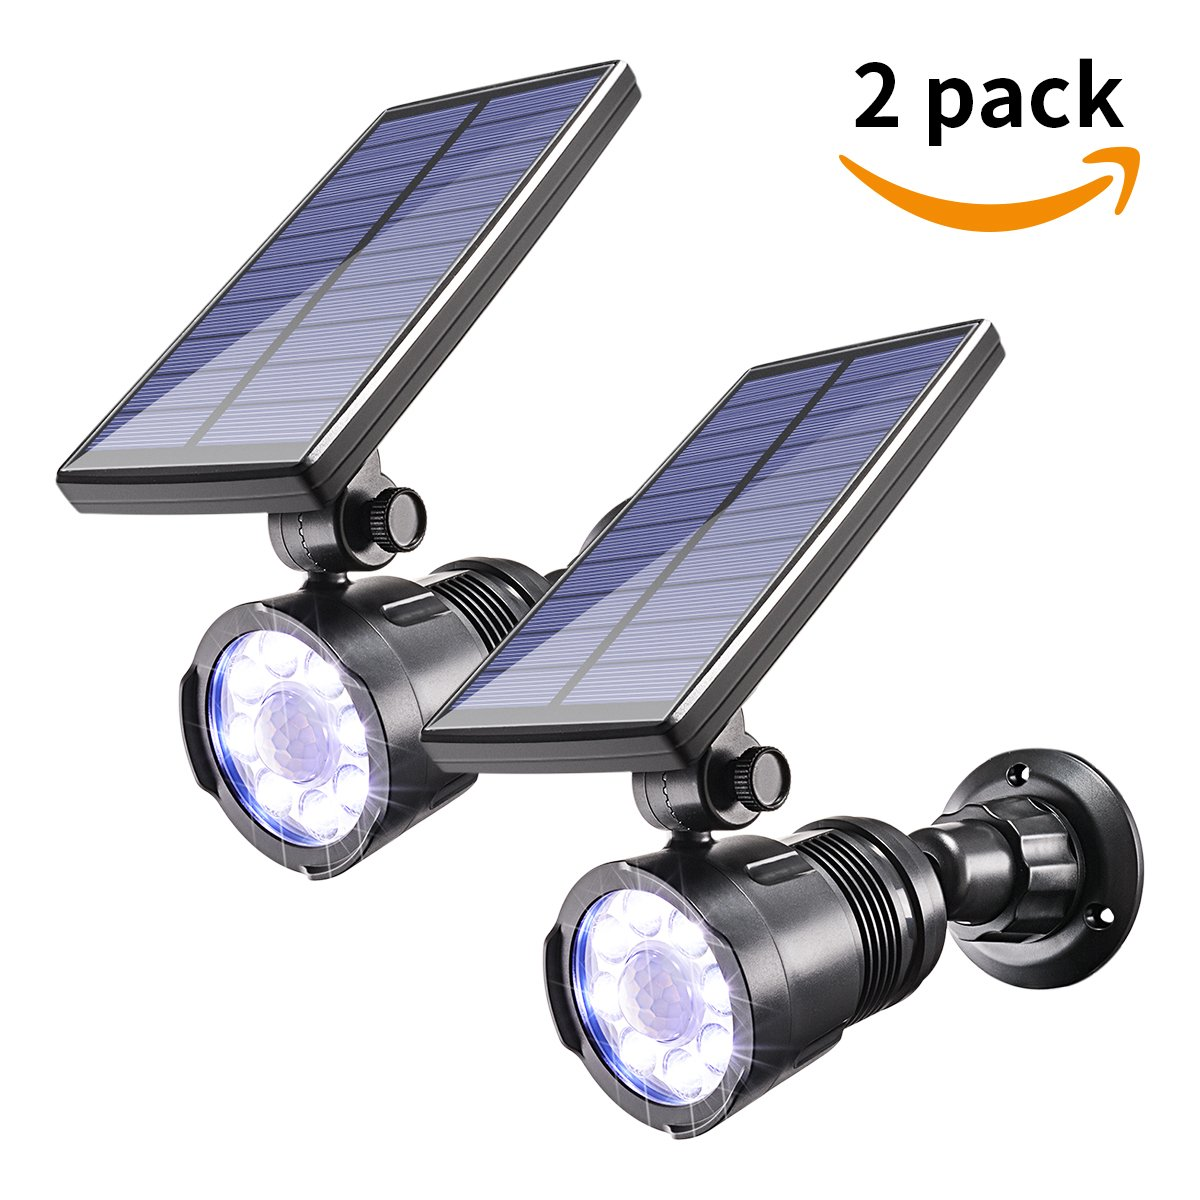 2PC Solar Spotlights LED Motion Sensor light,8 LED Solar Powered Motion Sensor Security Light With 4 Modes, 800LM 5.5v Adjustable Wireless Waterproof Outdoor Landscape Light For Garden Porch Patio